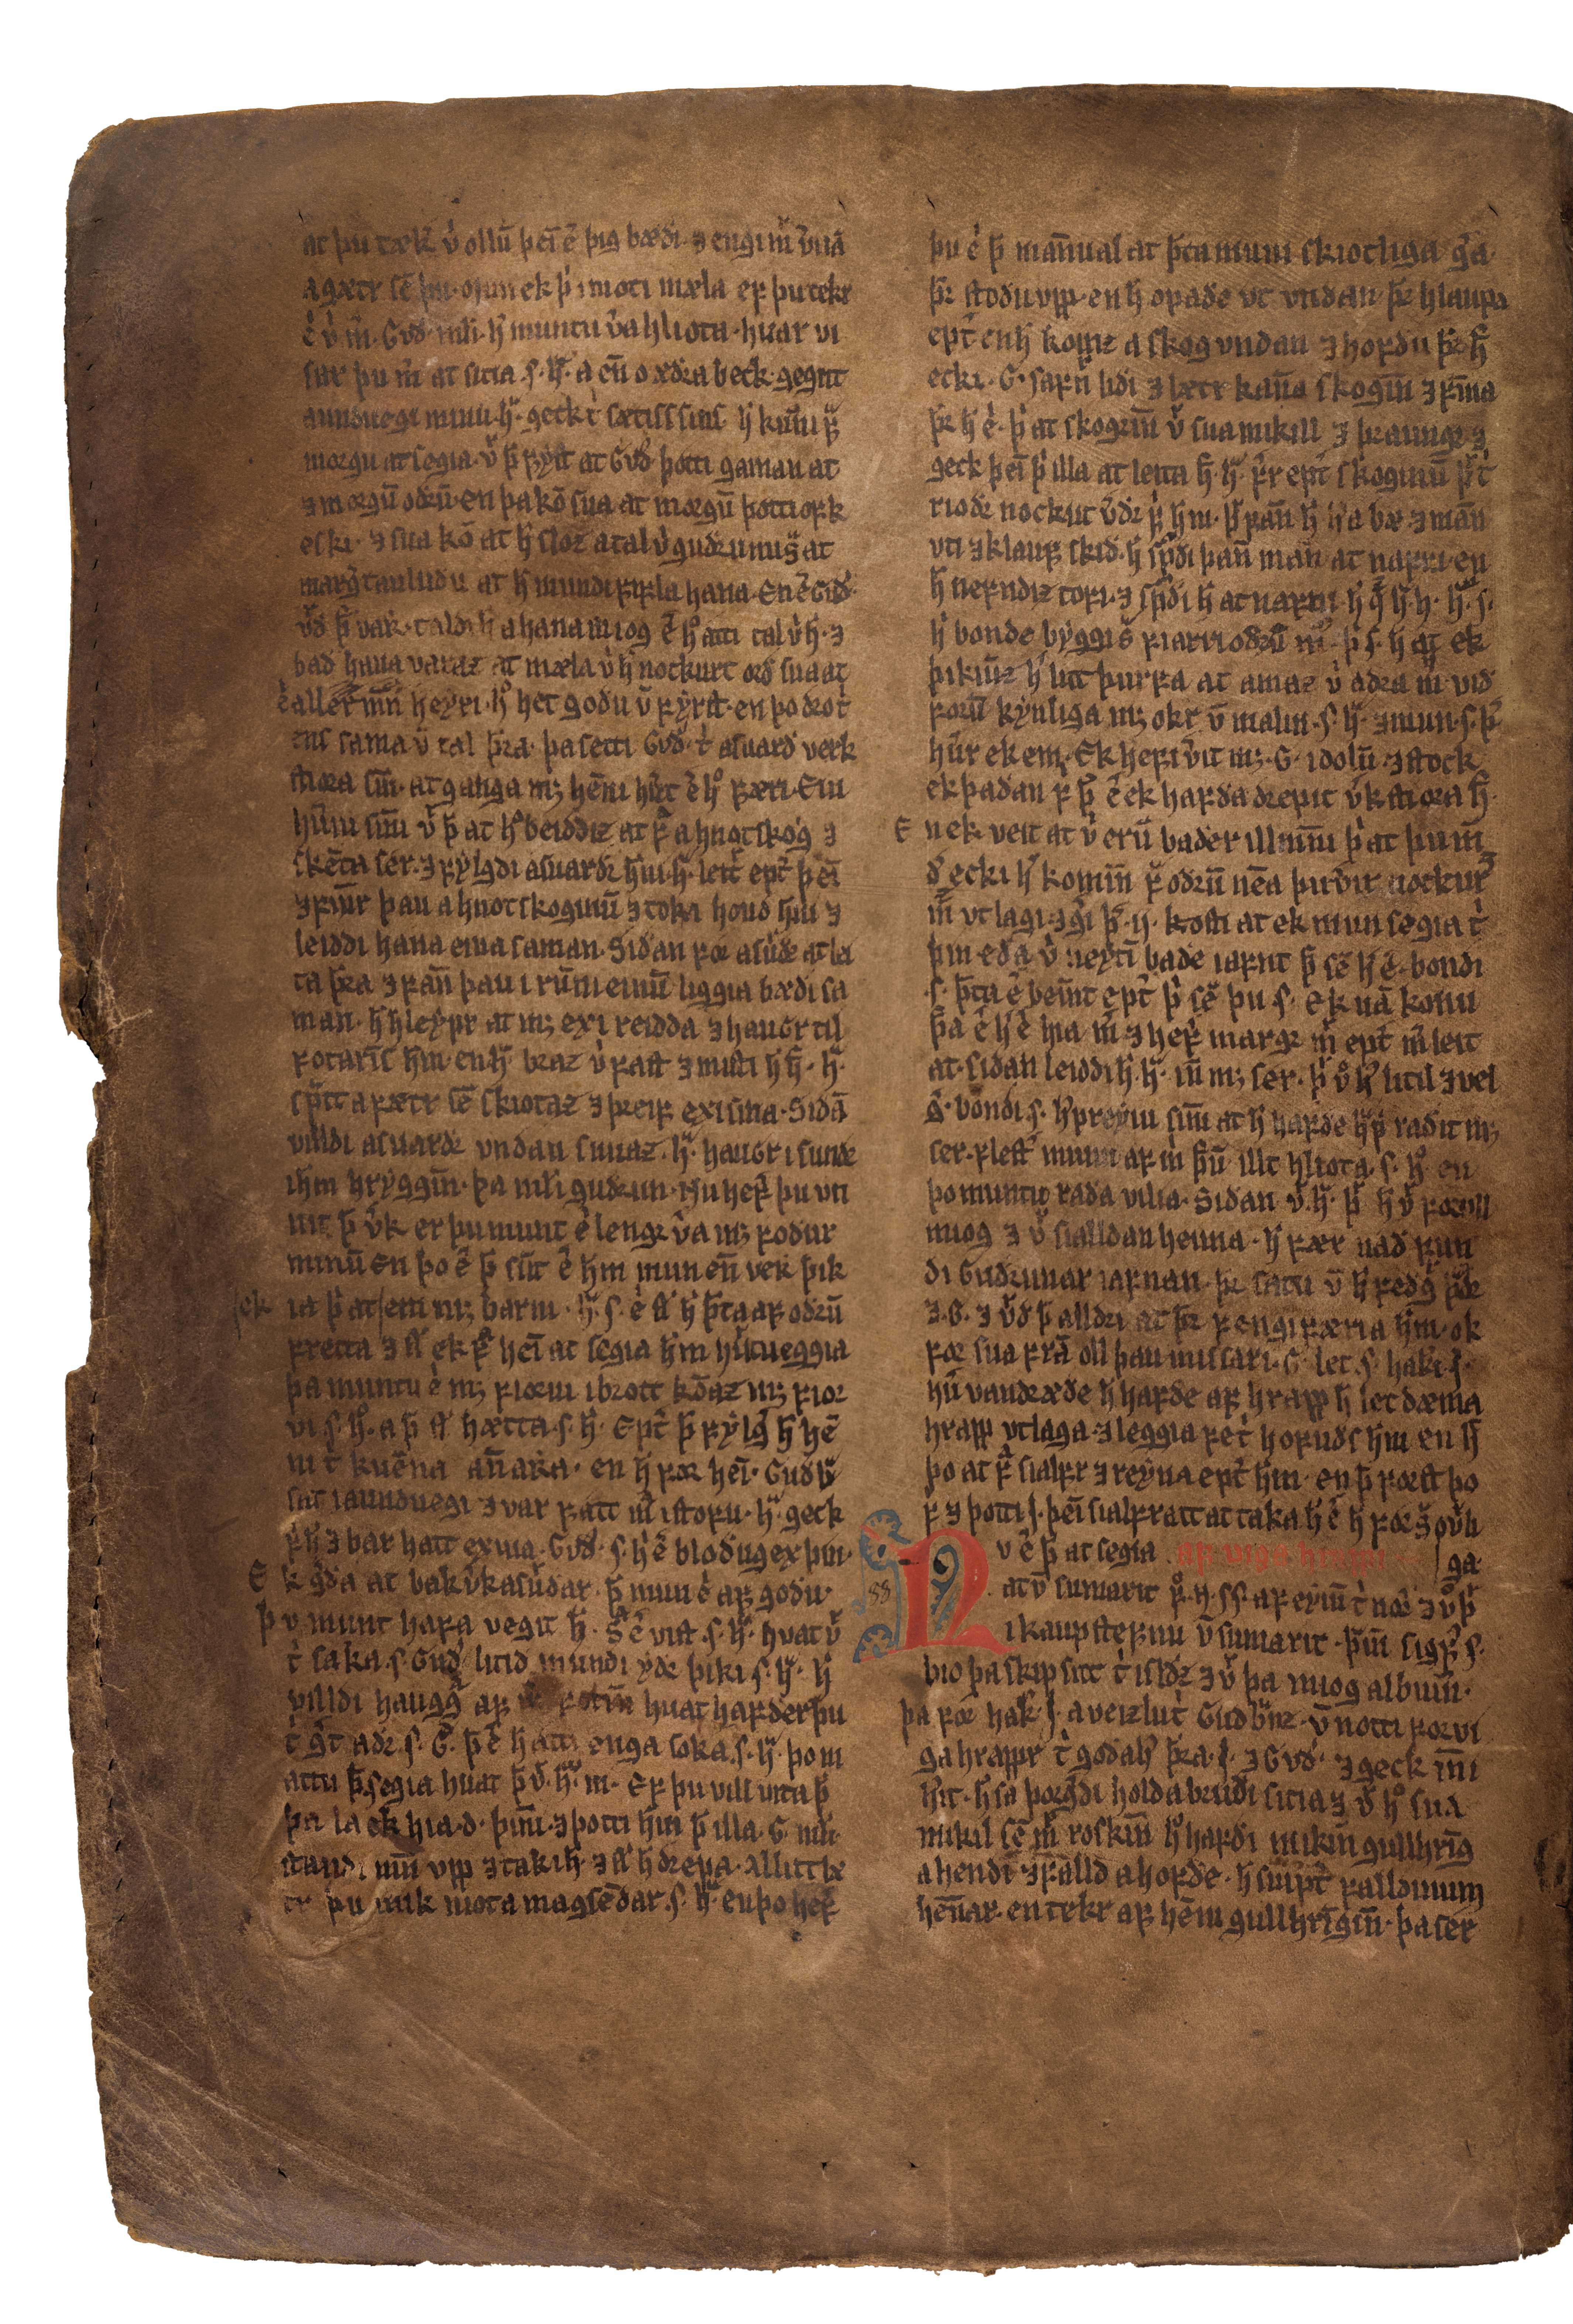 AM 132 fol - 31v